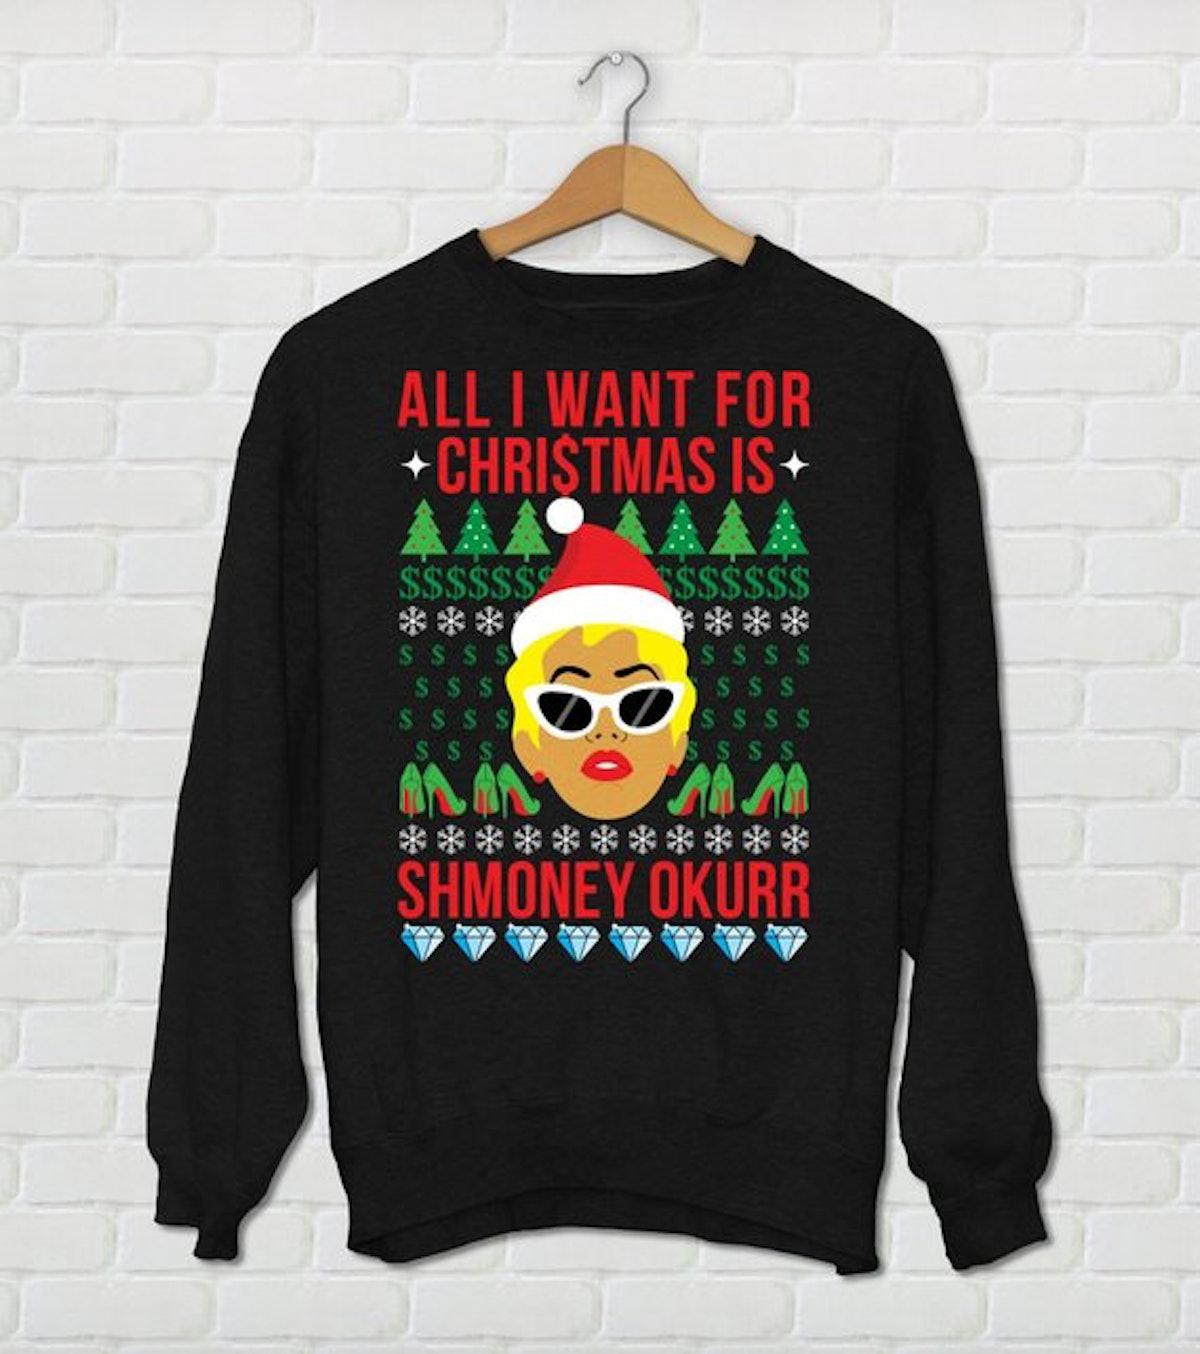 "Unisex Cardi B Christmas Sweater All I Want For Christmas Is Smoney Okurr"" Cardi B Holiday Sweater"